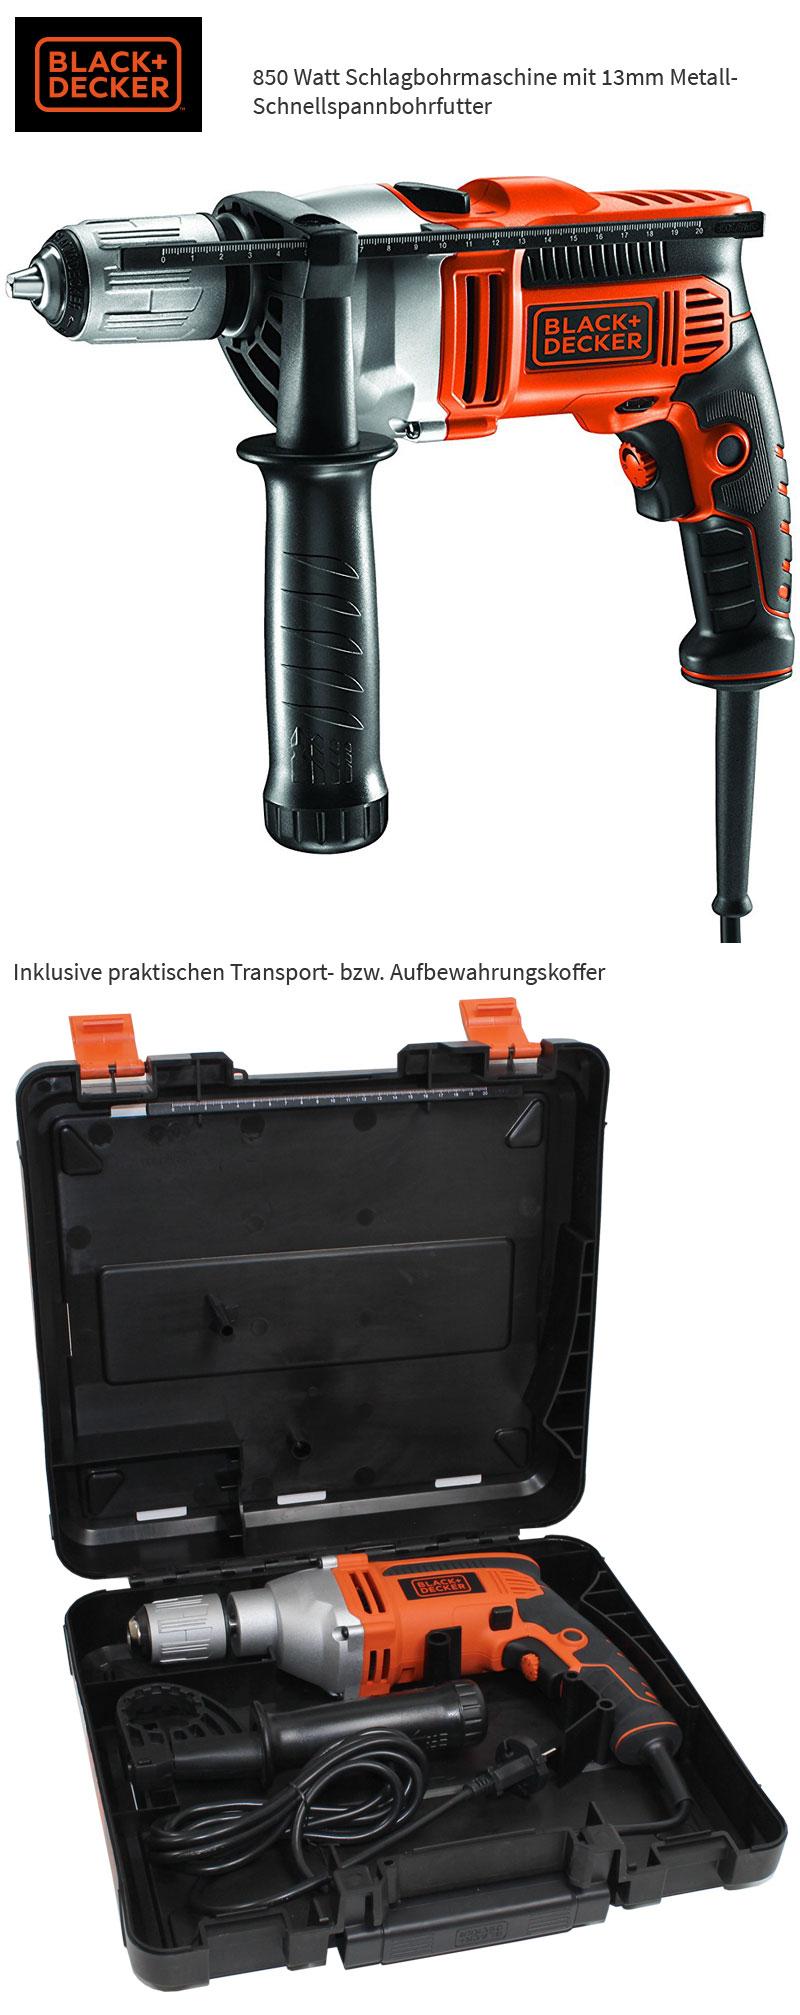 black decker kr 806 k qs schlag bohrmaschine inkl koffer 850 watt neu ovp ebay. Black Bedroom Furniture Sets. Home Design Ideas